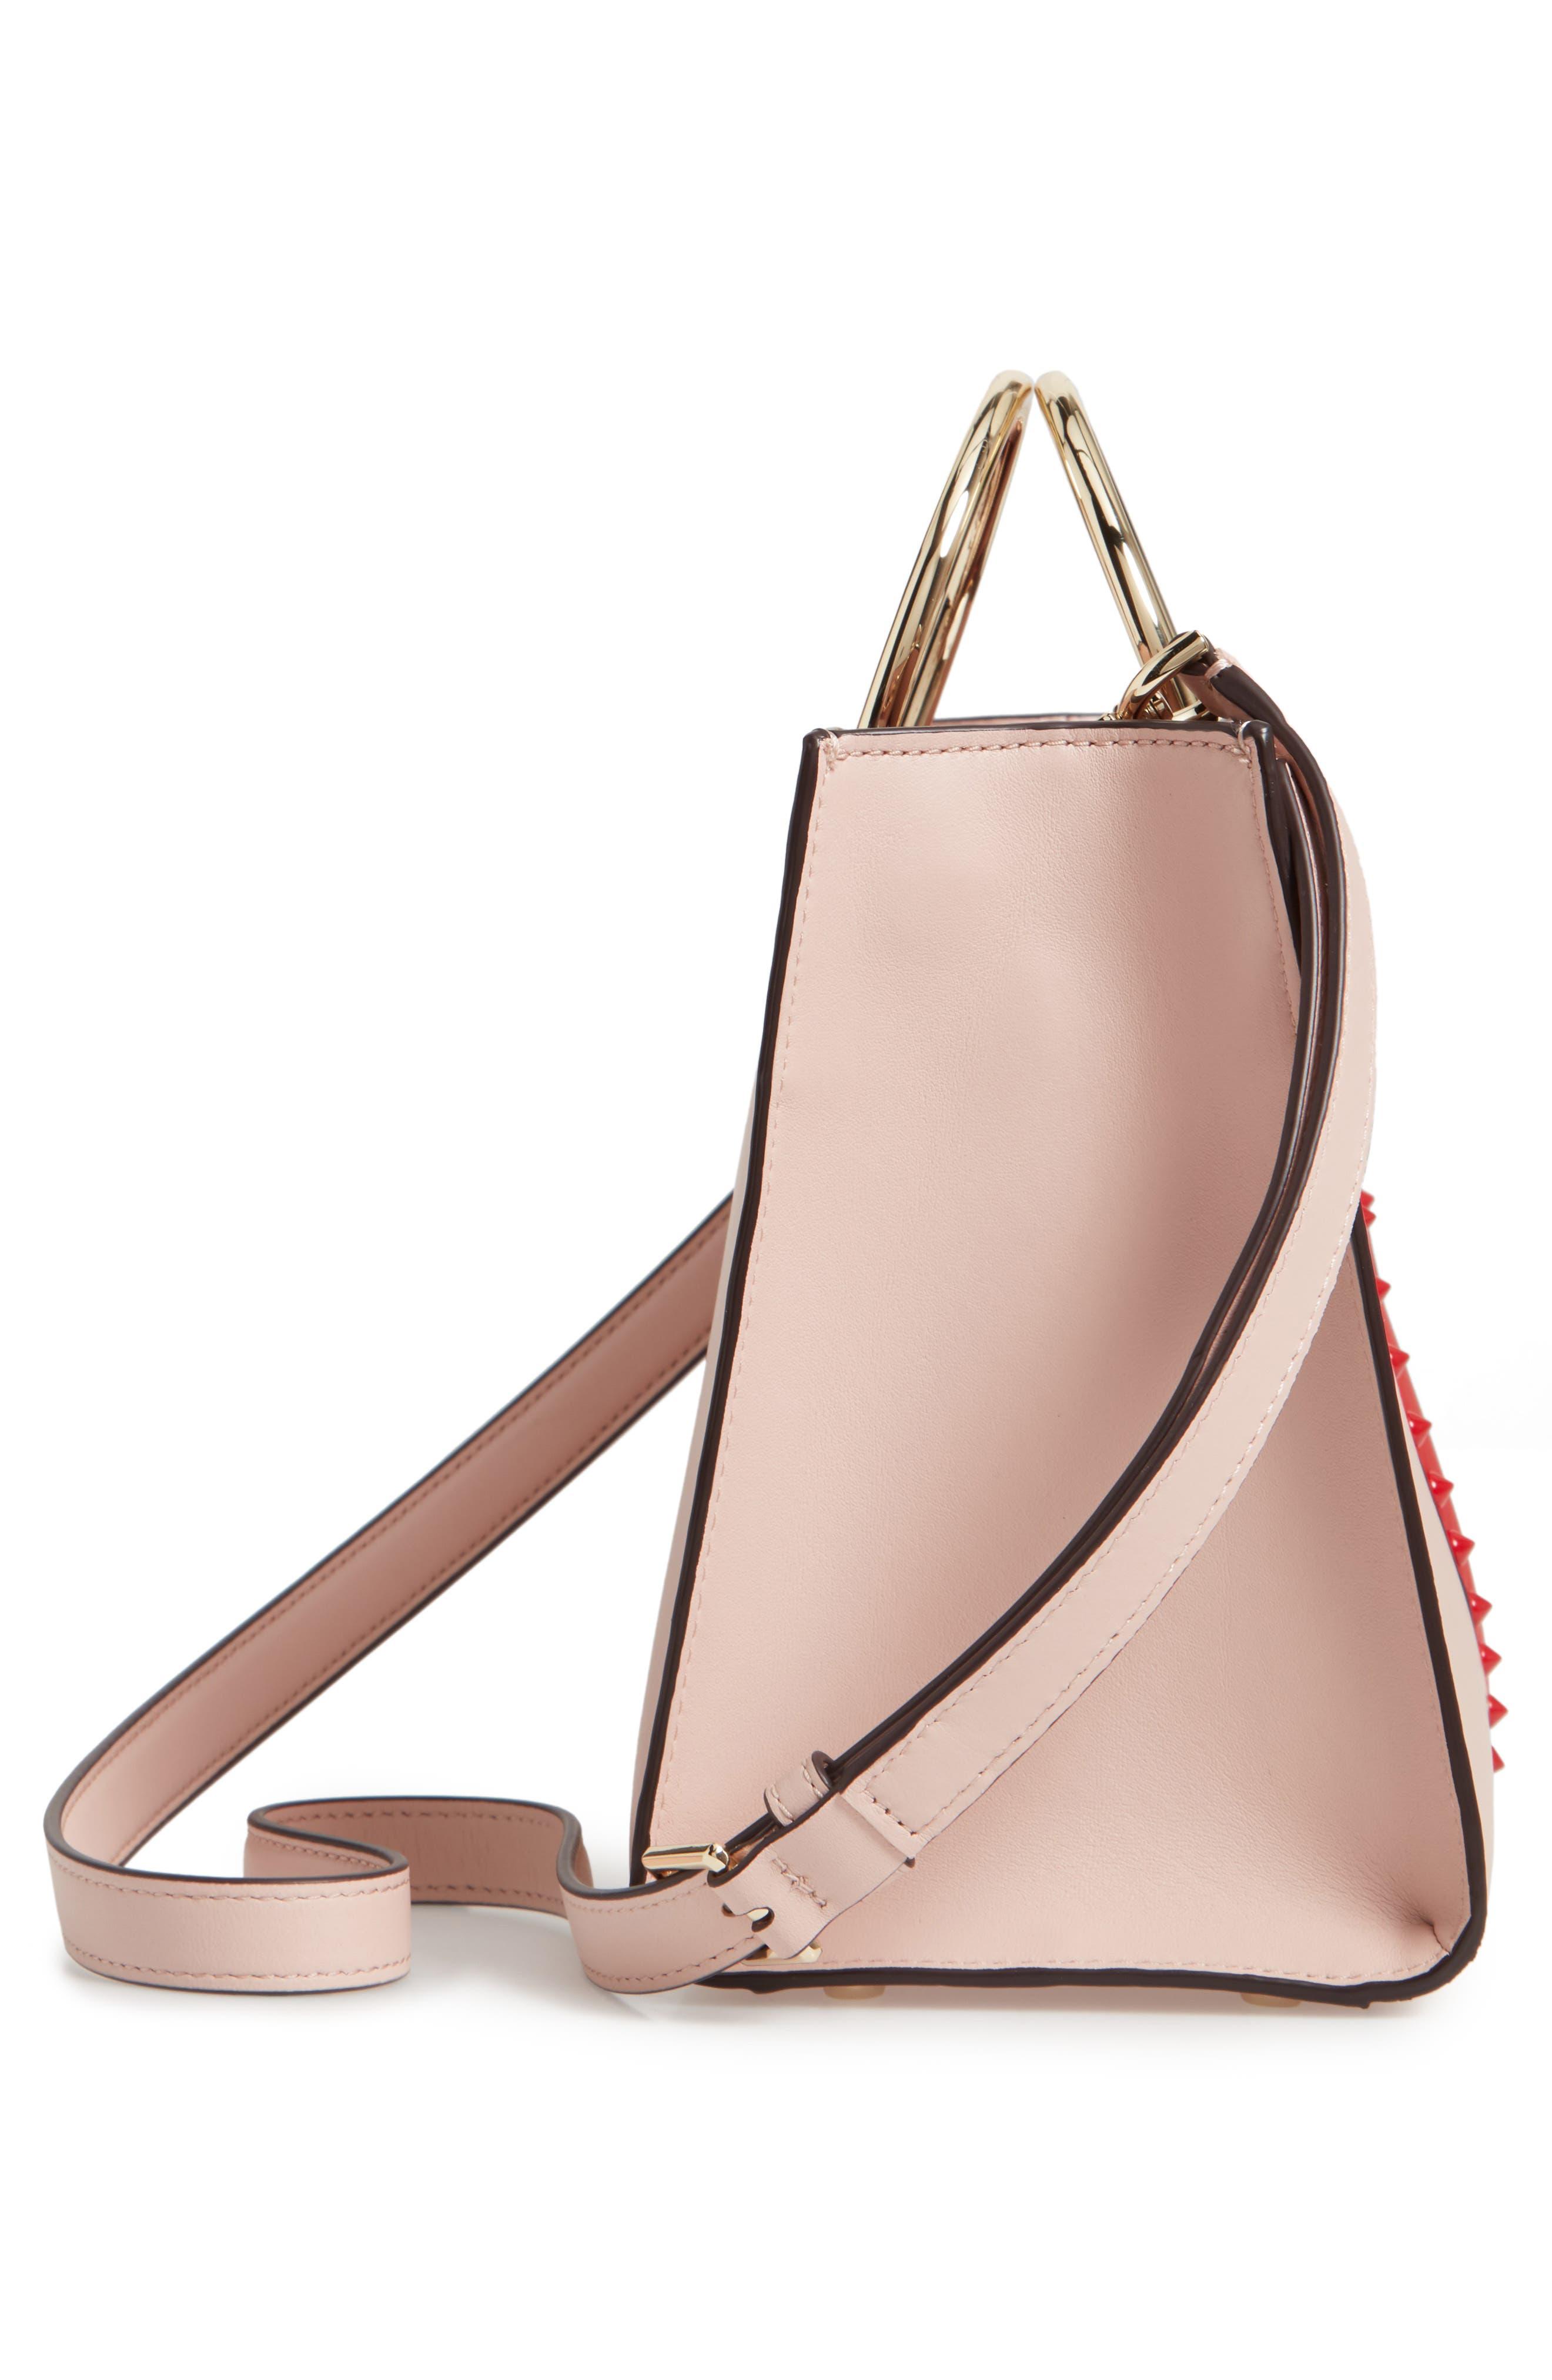 KATE SPADE NEW YORK, heart it - sam leather satchel, Alternate thumbnail 5, color, 650